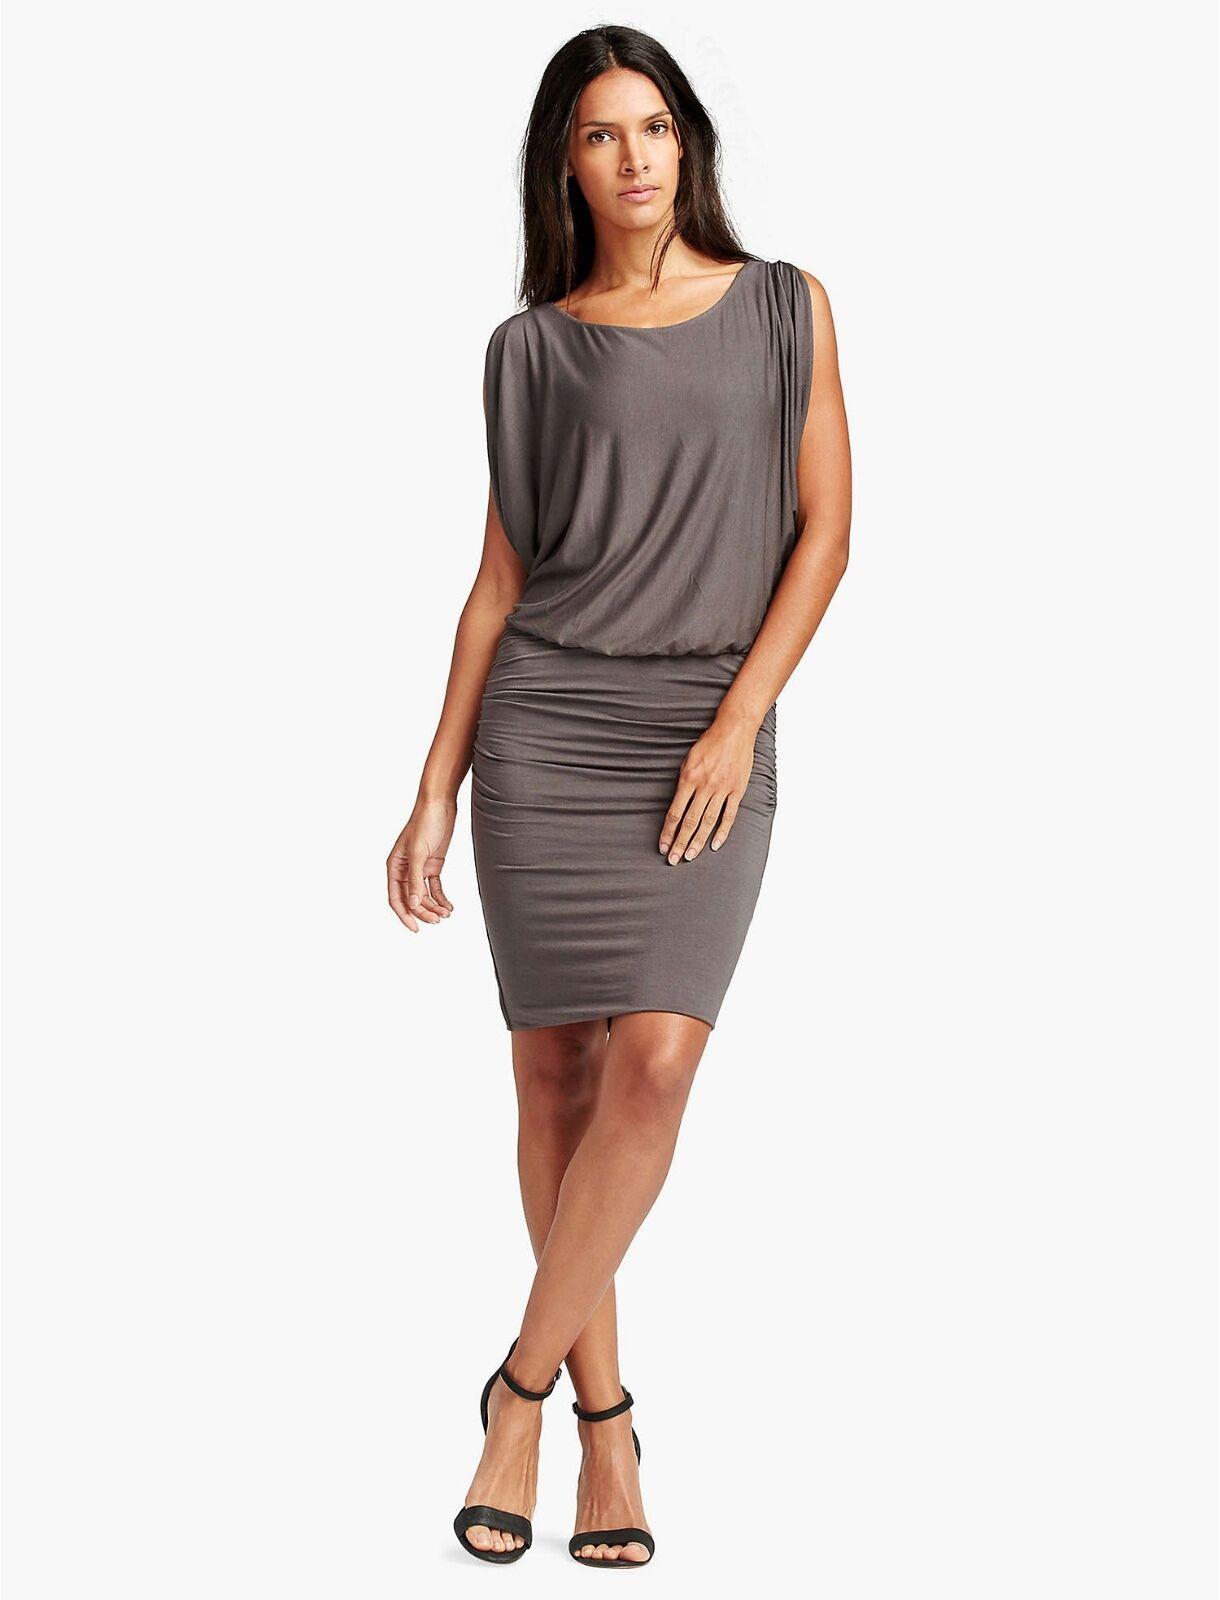 Lucky Brand - Damen XS - Nwt - Braun Gerüscht Kalte Schulter Strick Tulpenkleid